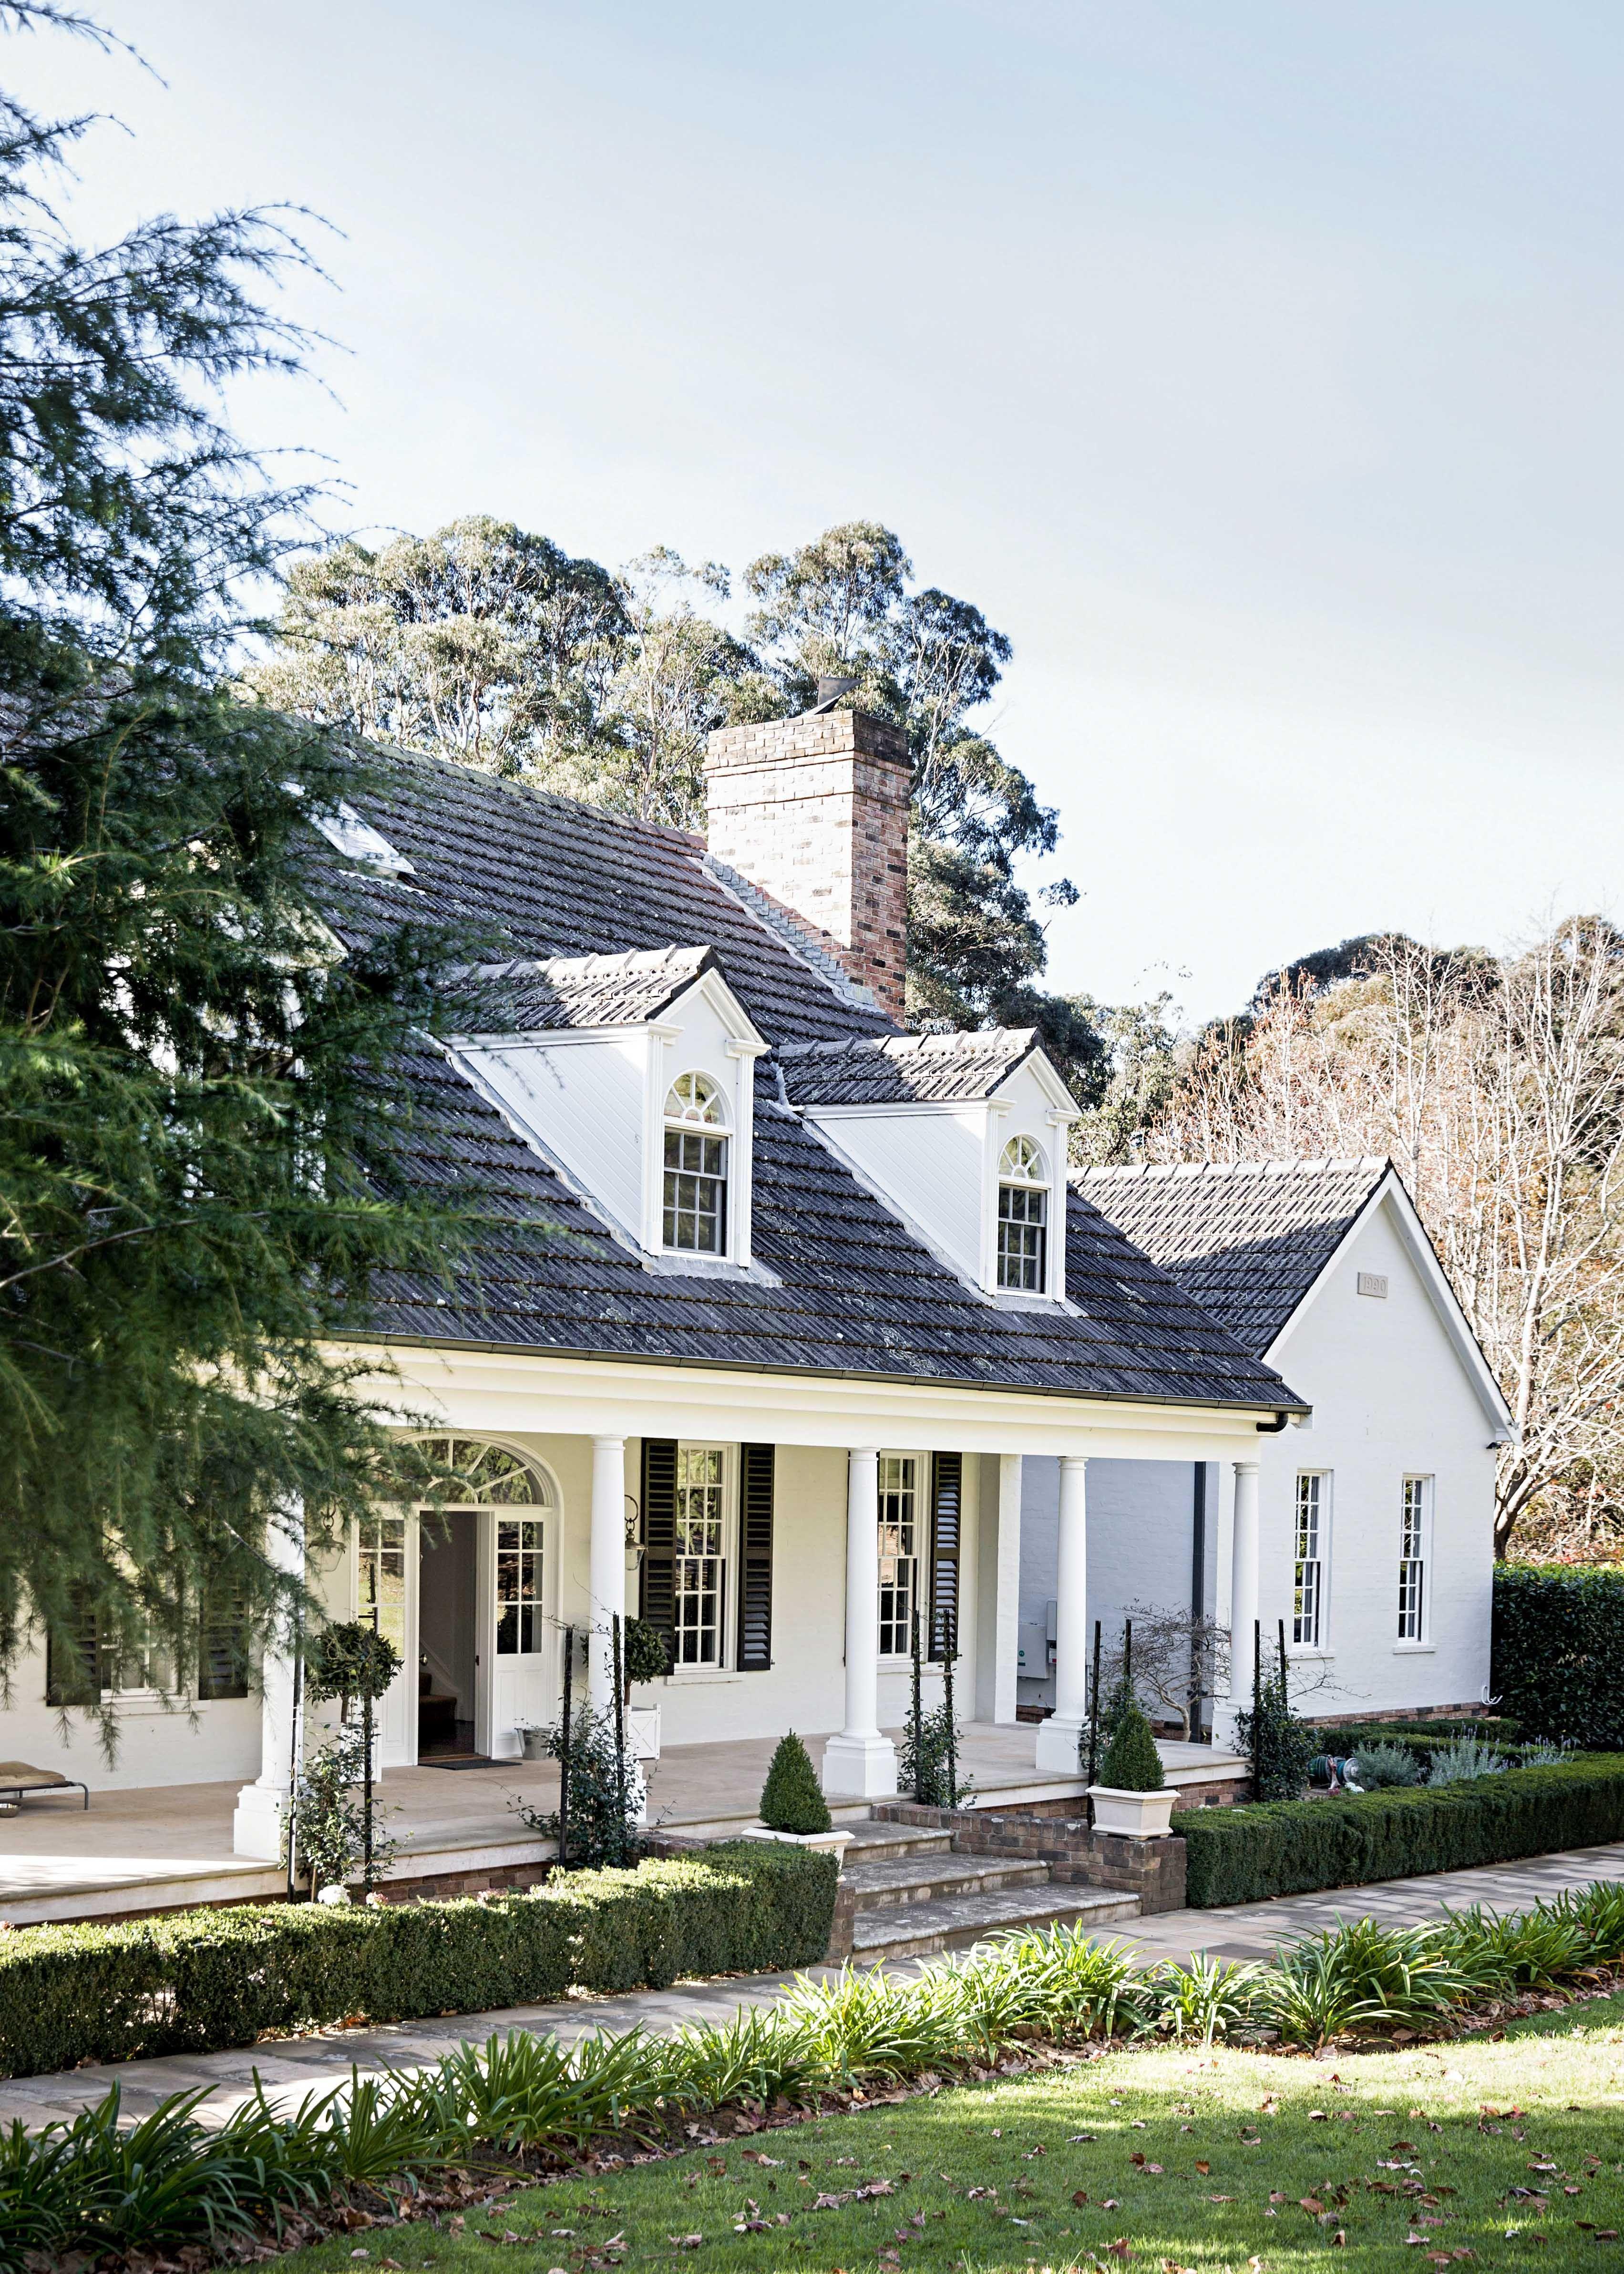 17 Enchanting Australian Country Farmhouse To Maximize Your